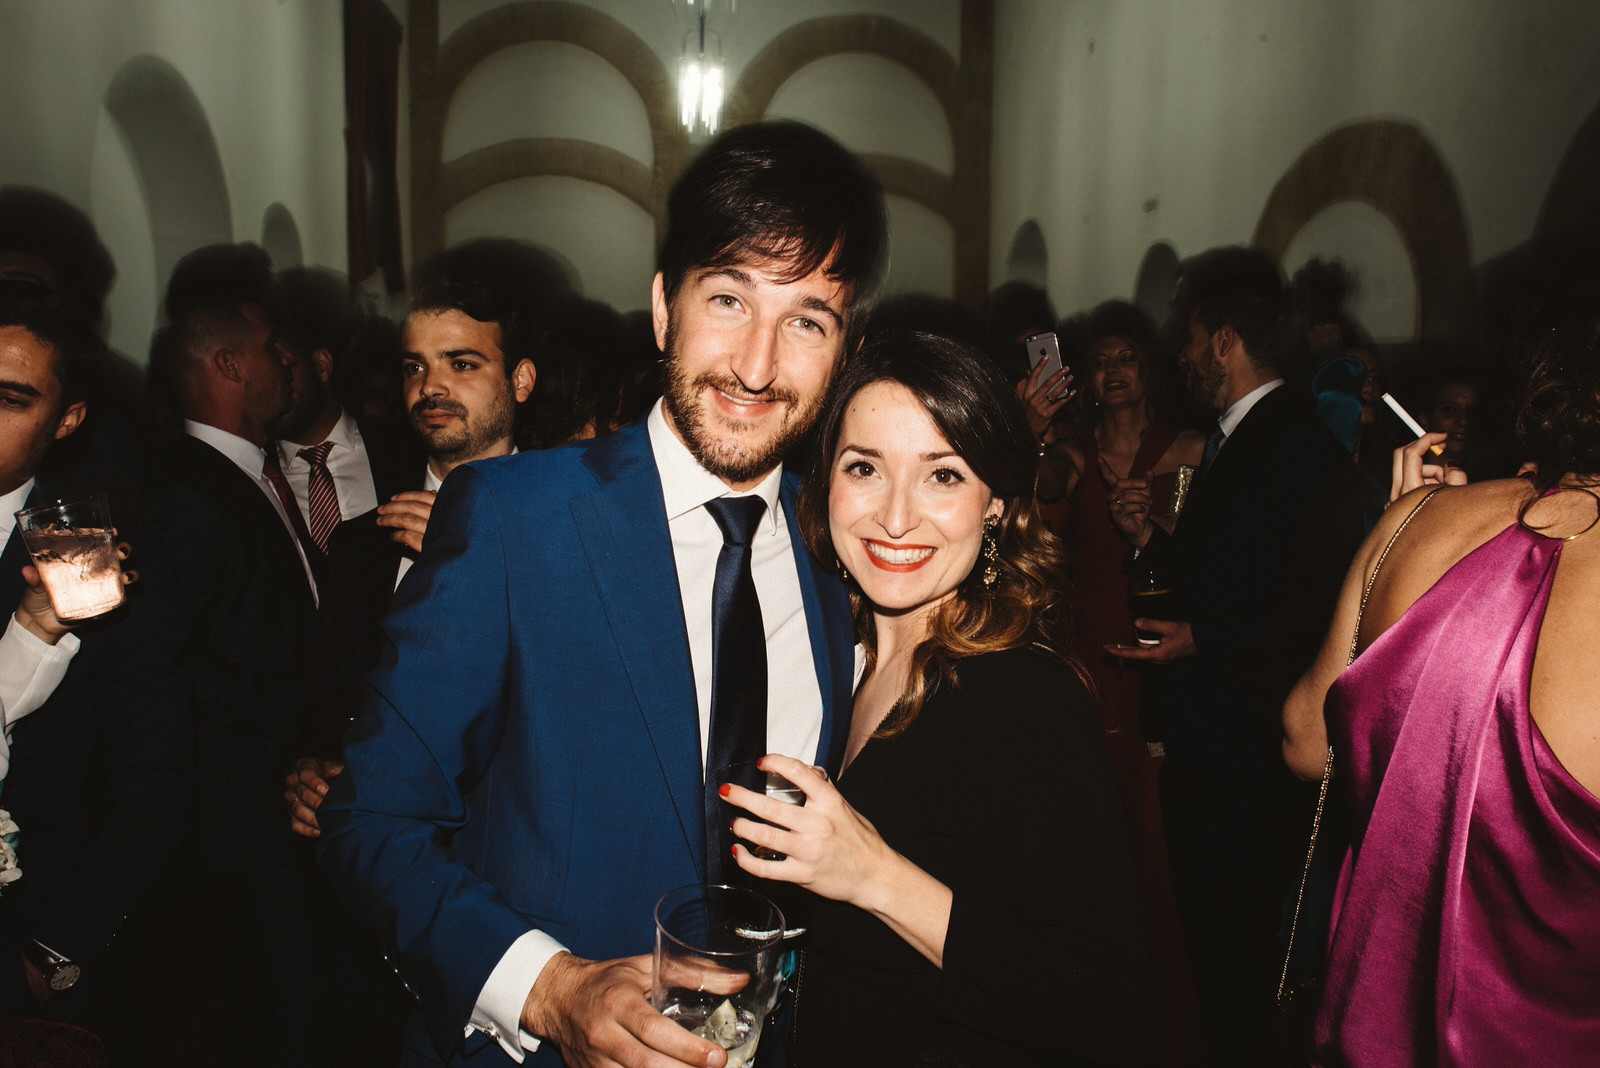 fotografo de bodas sevilla - fotografo boda - fotografía sevilla - Andrés AmarilloAAA_3820- fine.JPG